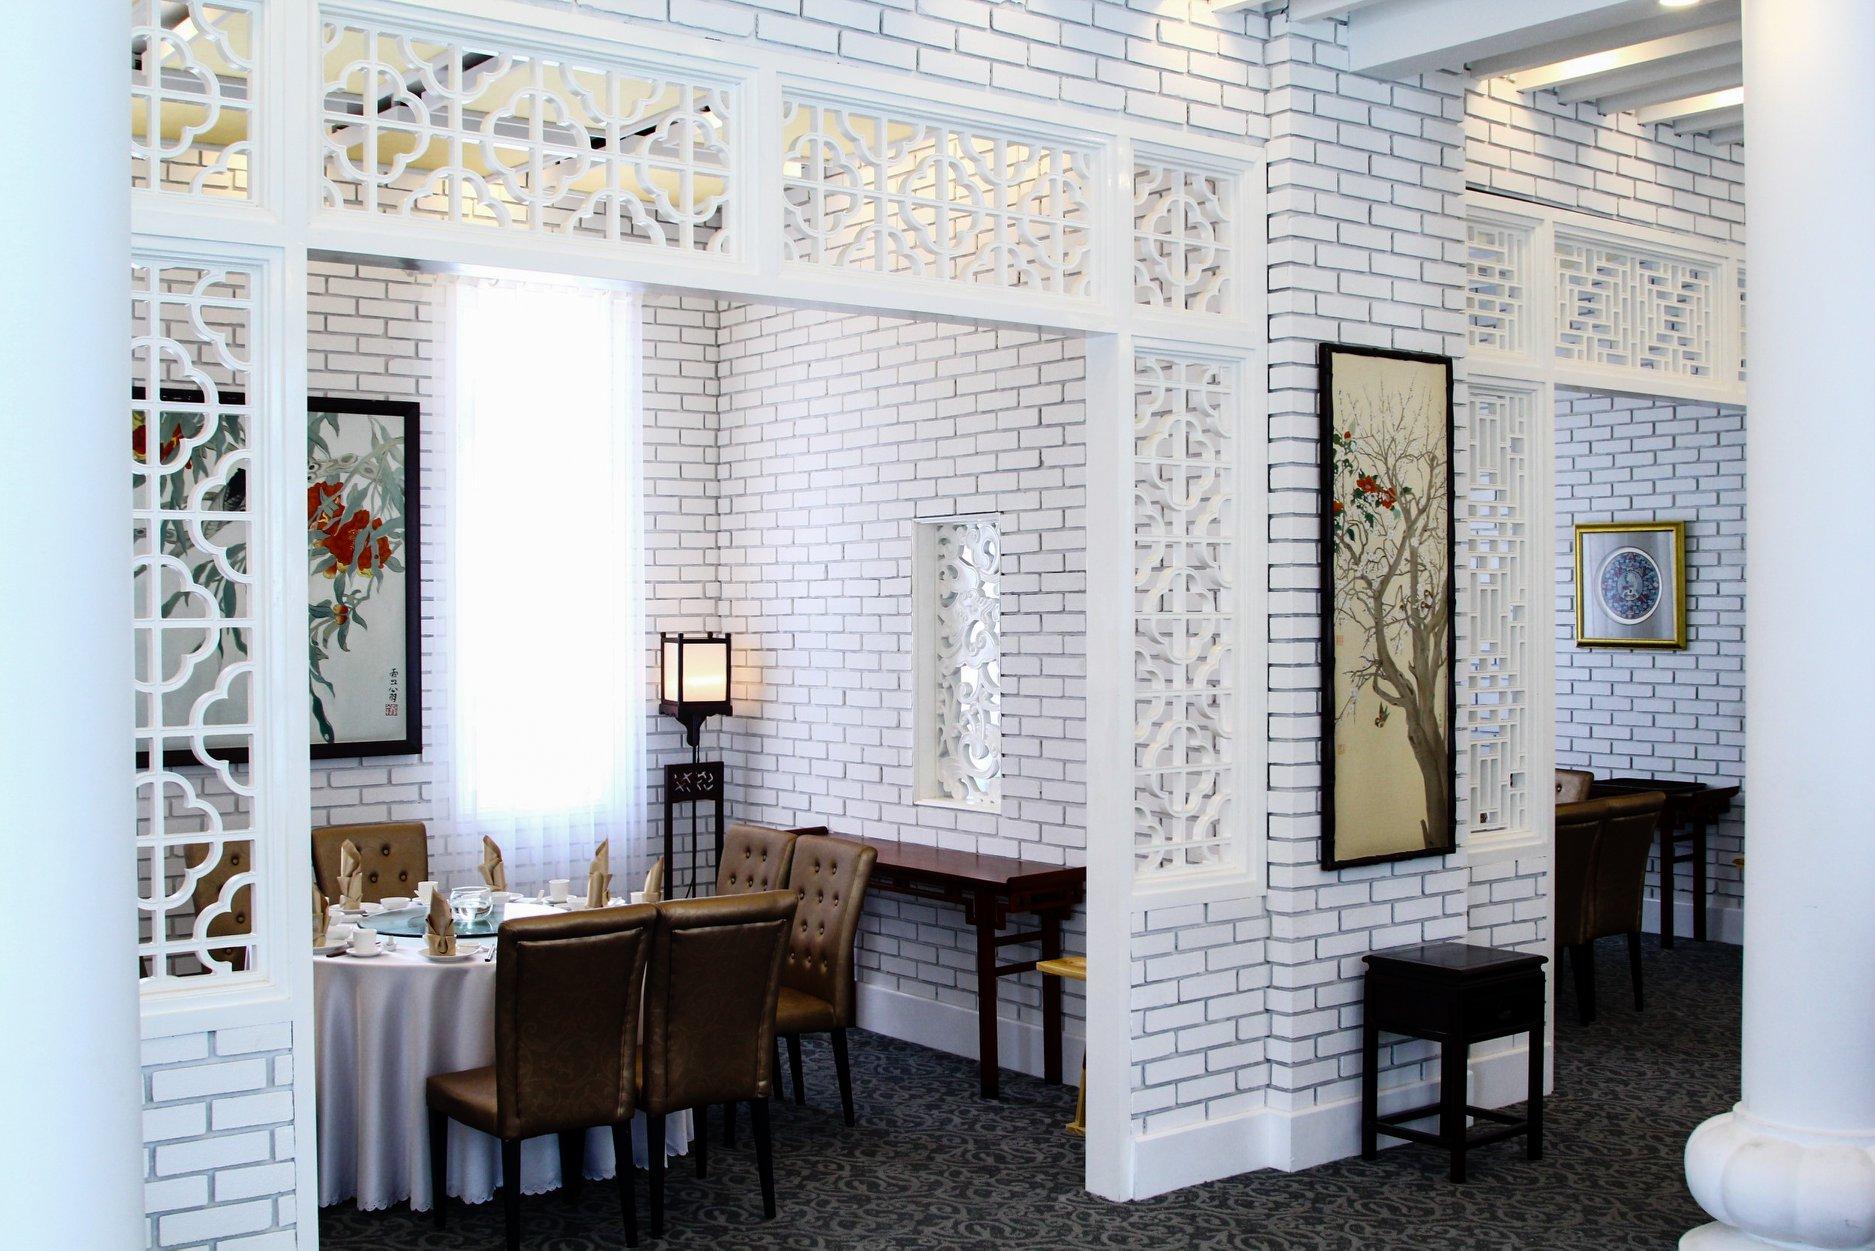 hong kong-themed restaurant shang garden interior